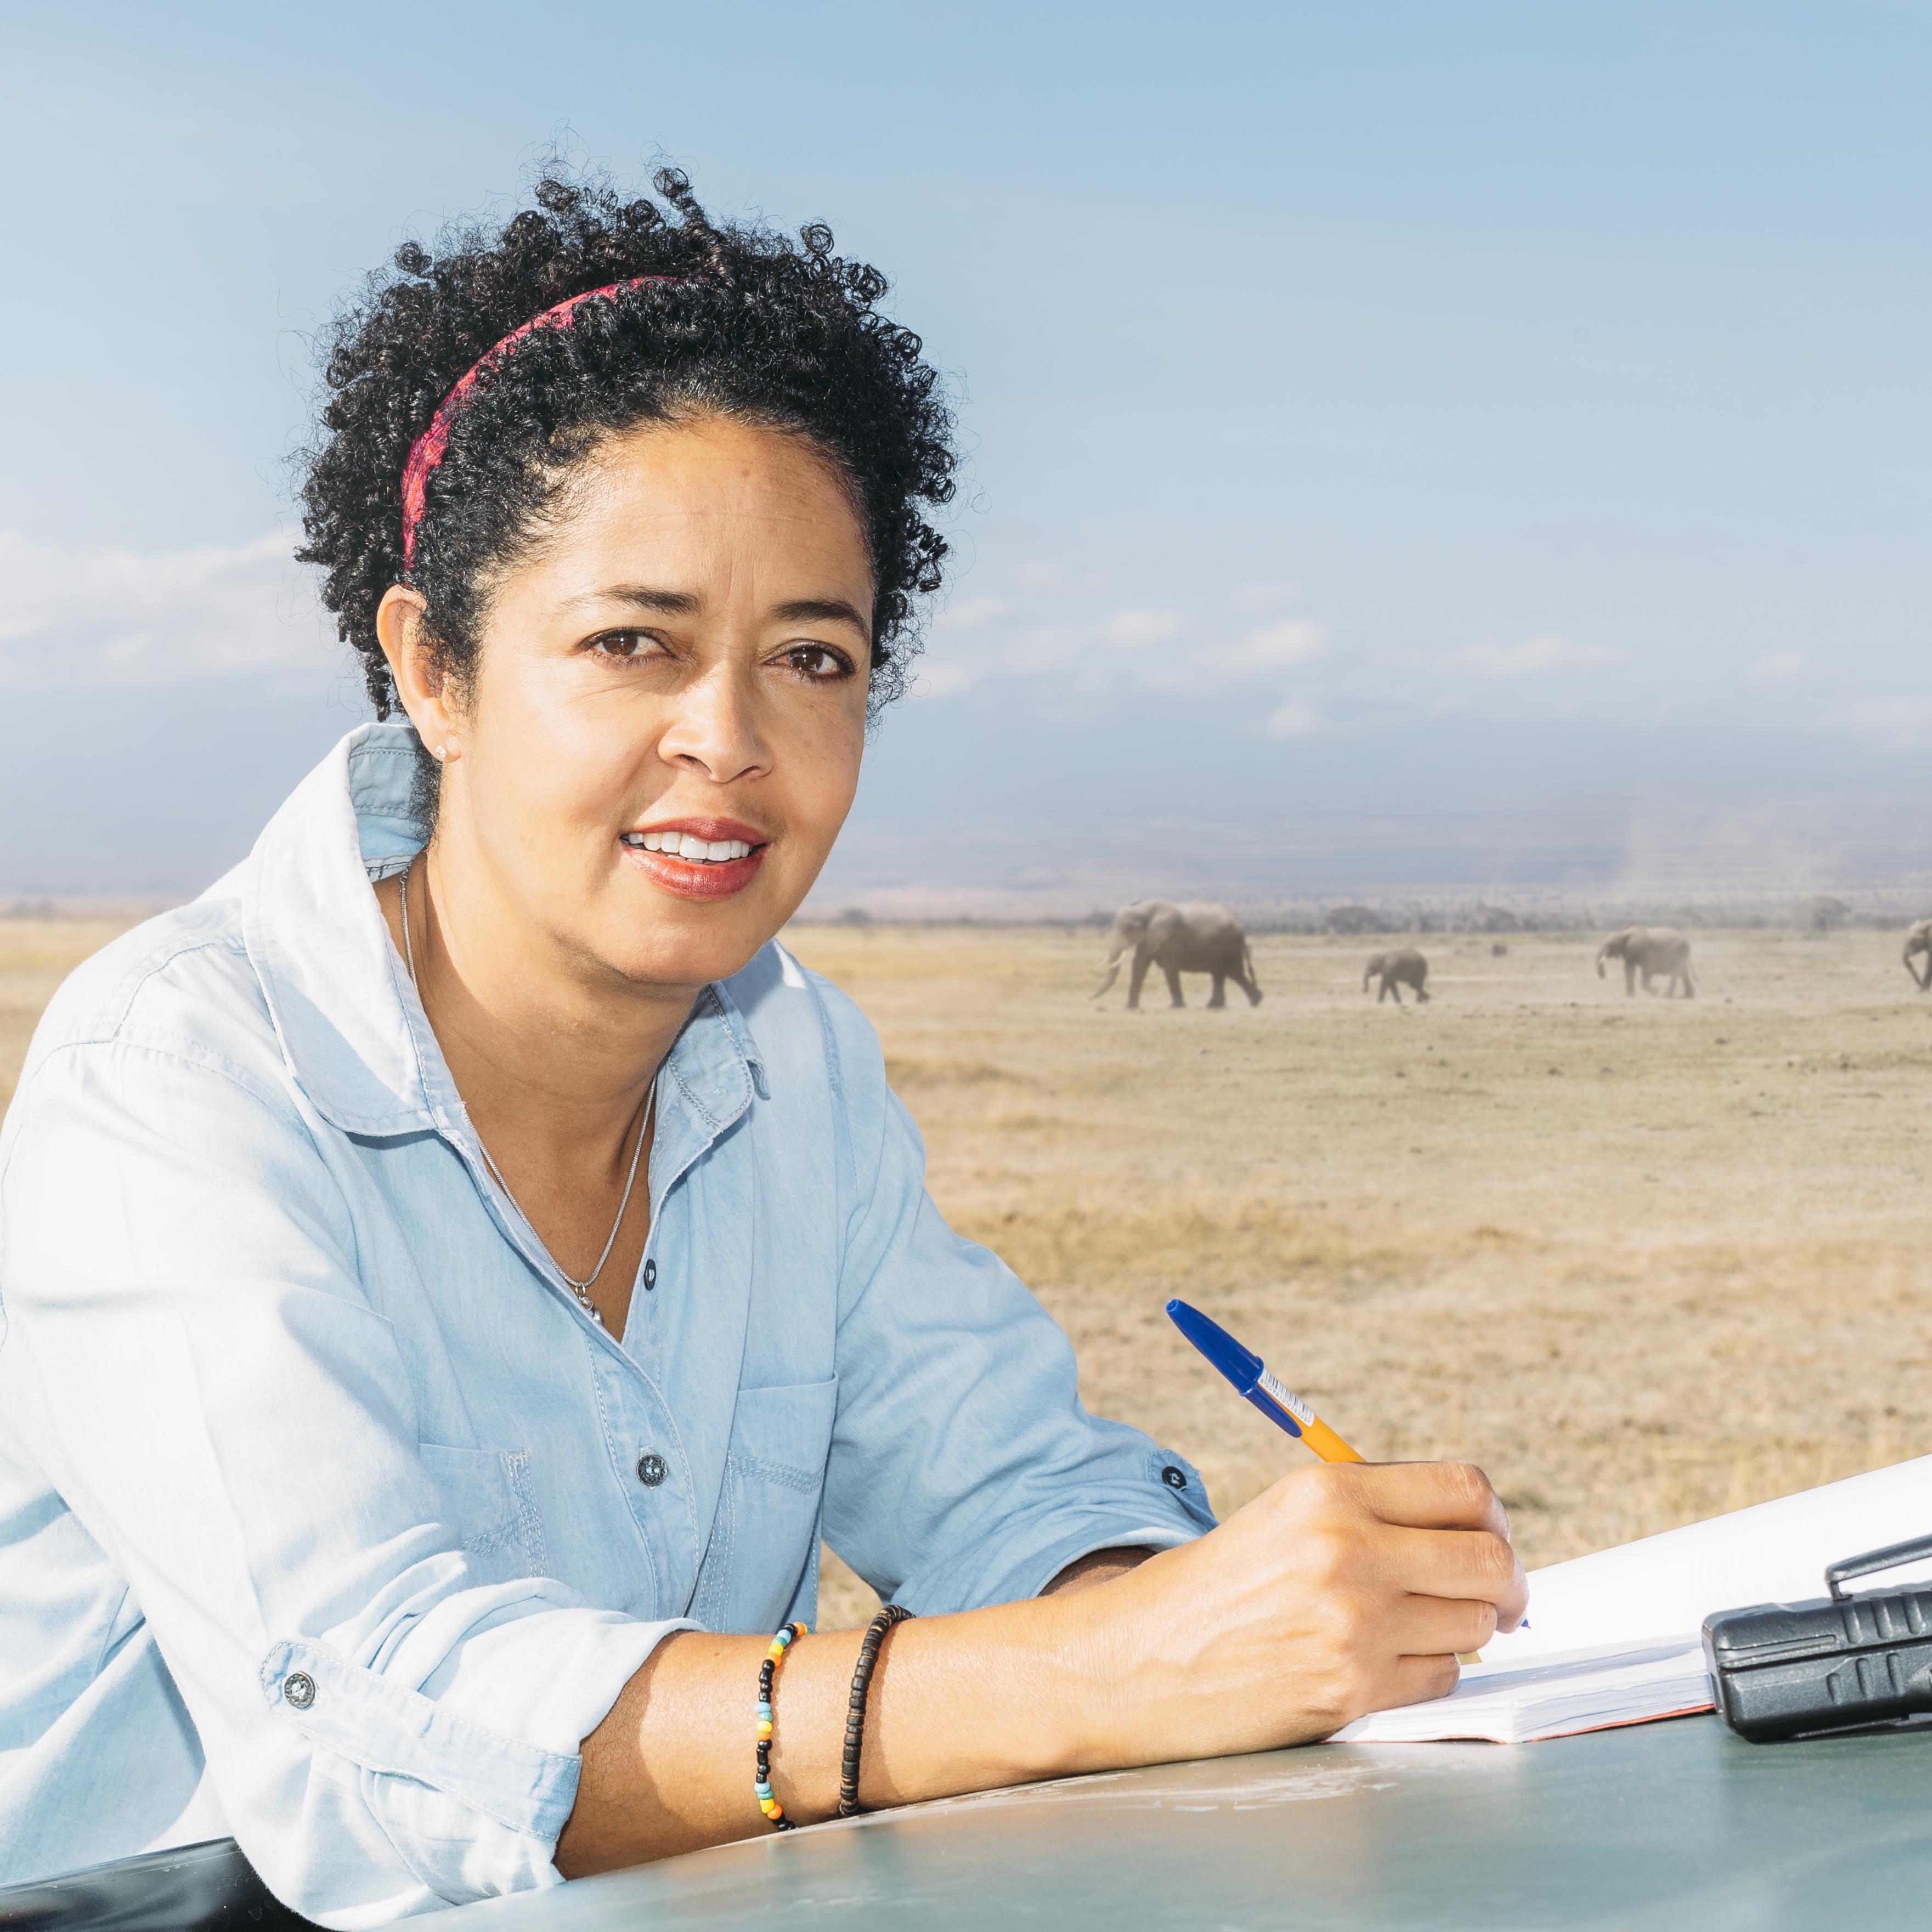 Paula Kahumbu Amboseli headshot.jpg